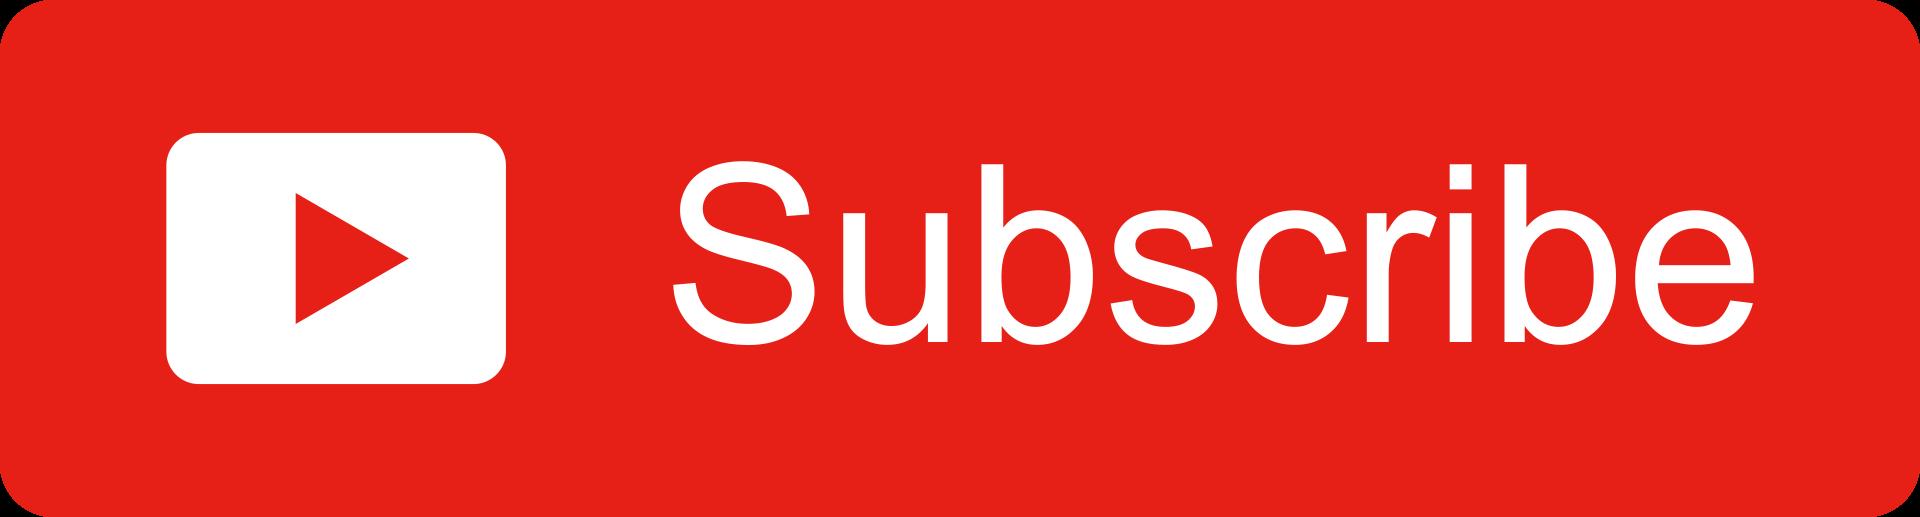 Subscribe Coder Sơn Trang Youtube